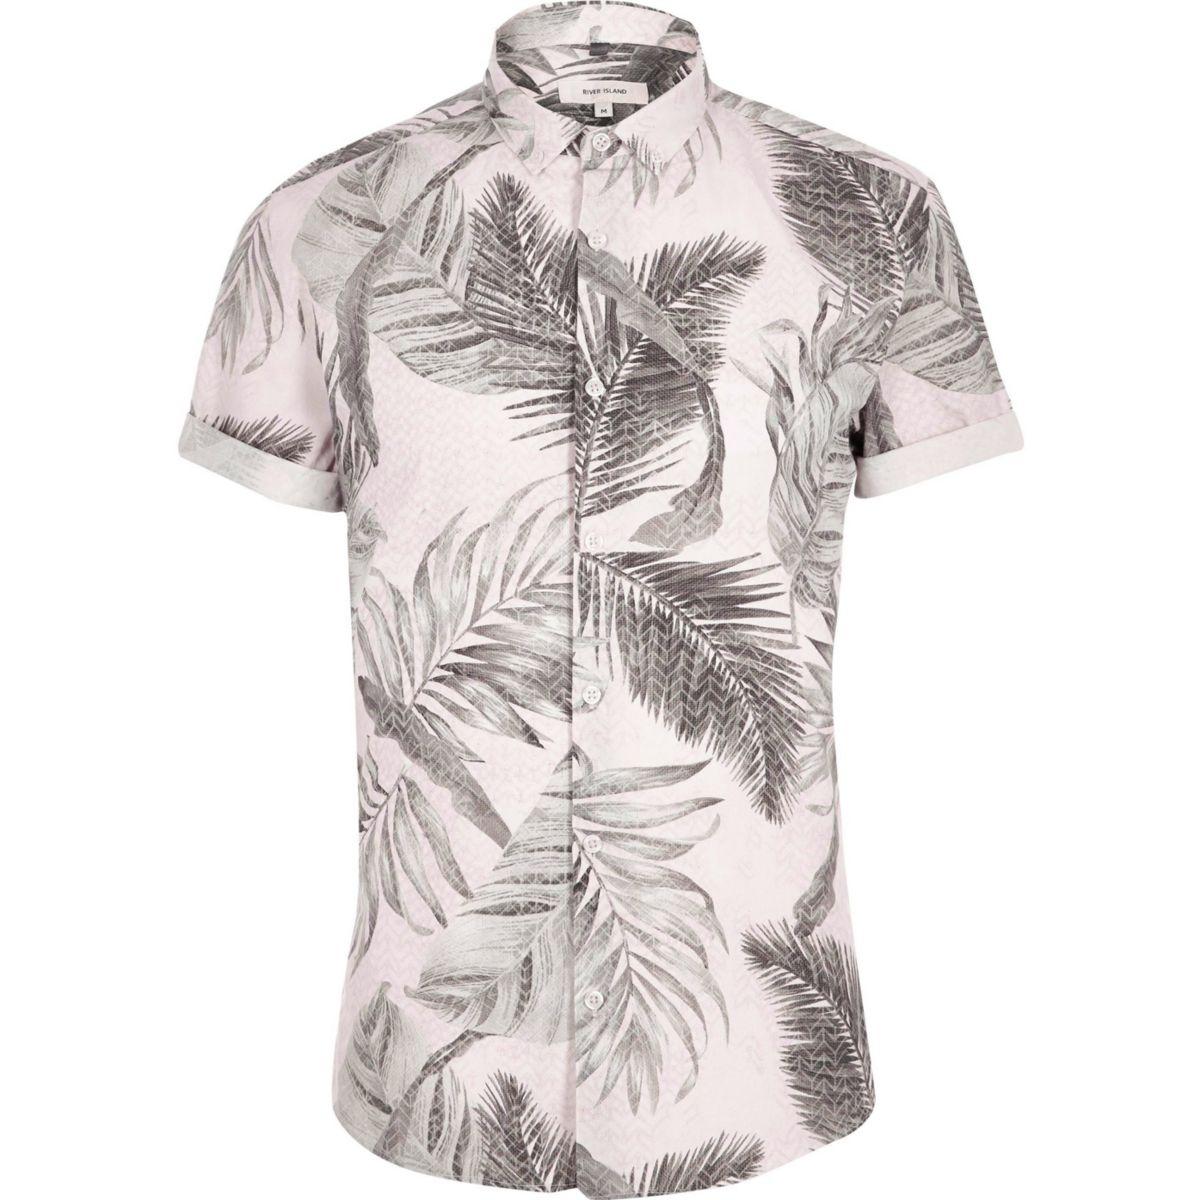 Light orange tropical short sleeve shirt